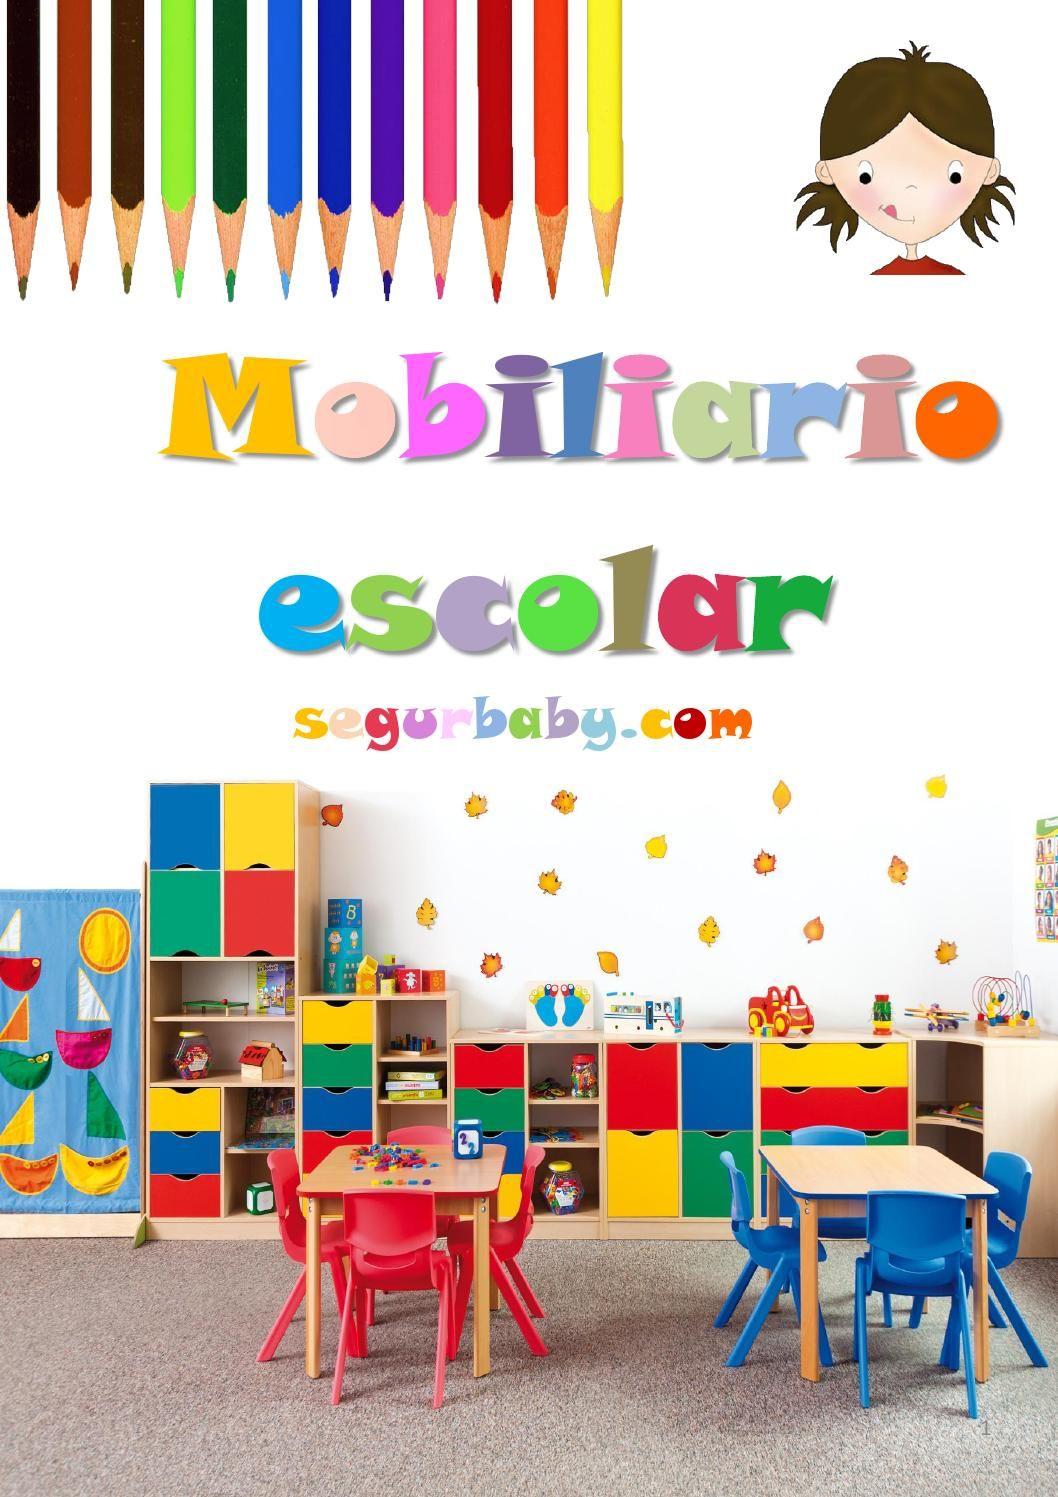 Cat logo de mobiliario escolar en 2019 para la guarder a kids furniture kindergarten - Mobiliario zapateria infantil ...